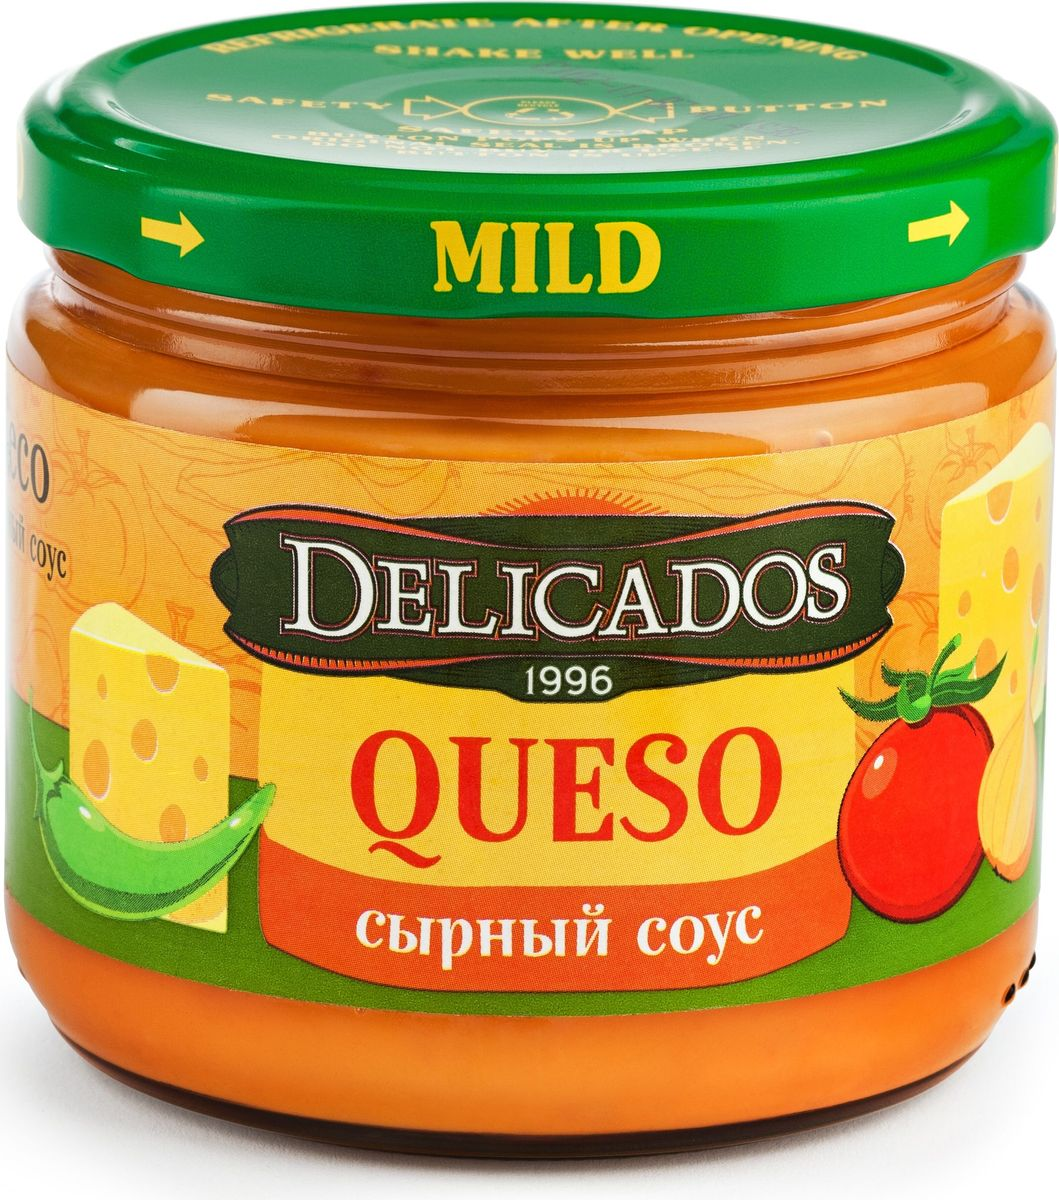 Delicados соус кесо сырный, 312 гбгэ001Соус сырный Кесо сочетается с Nachos Delicados, омлетами, пастой.